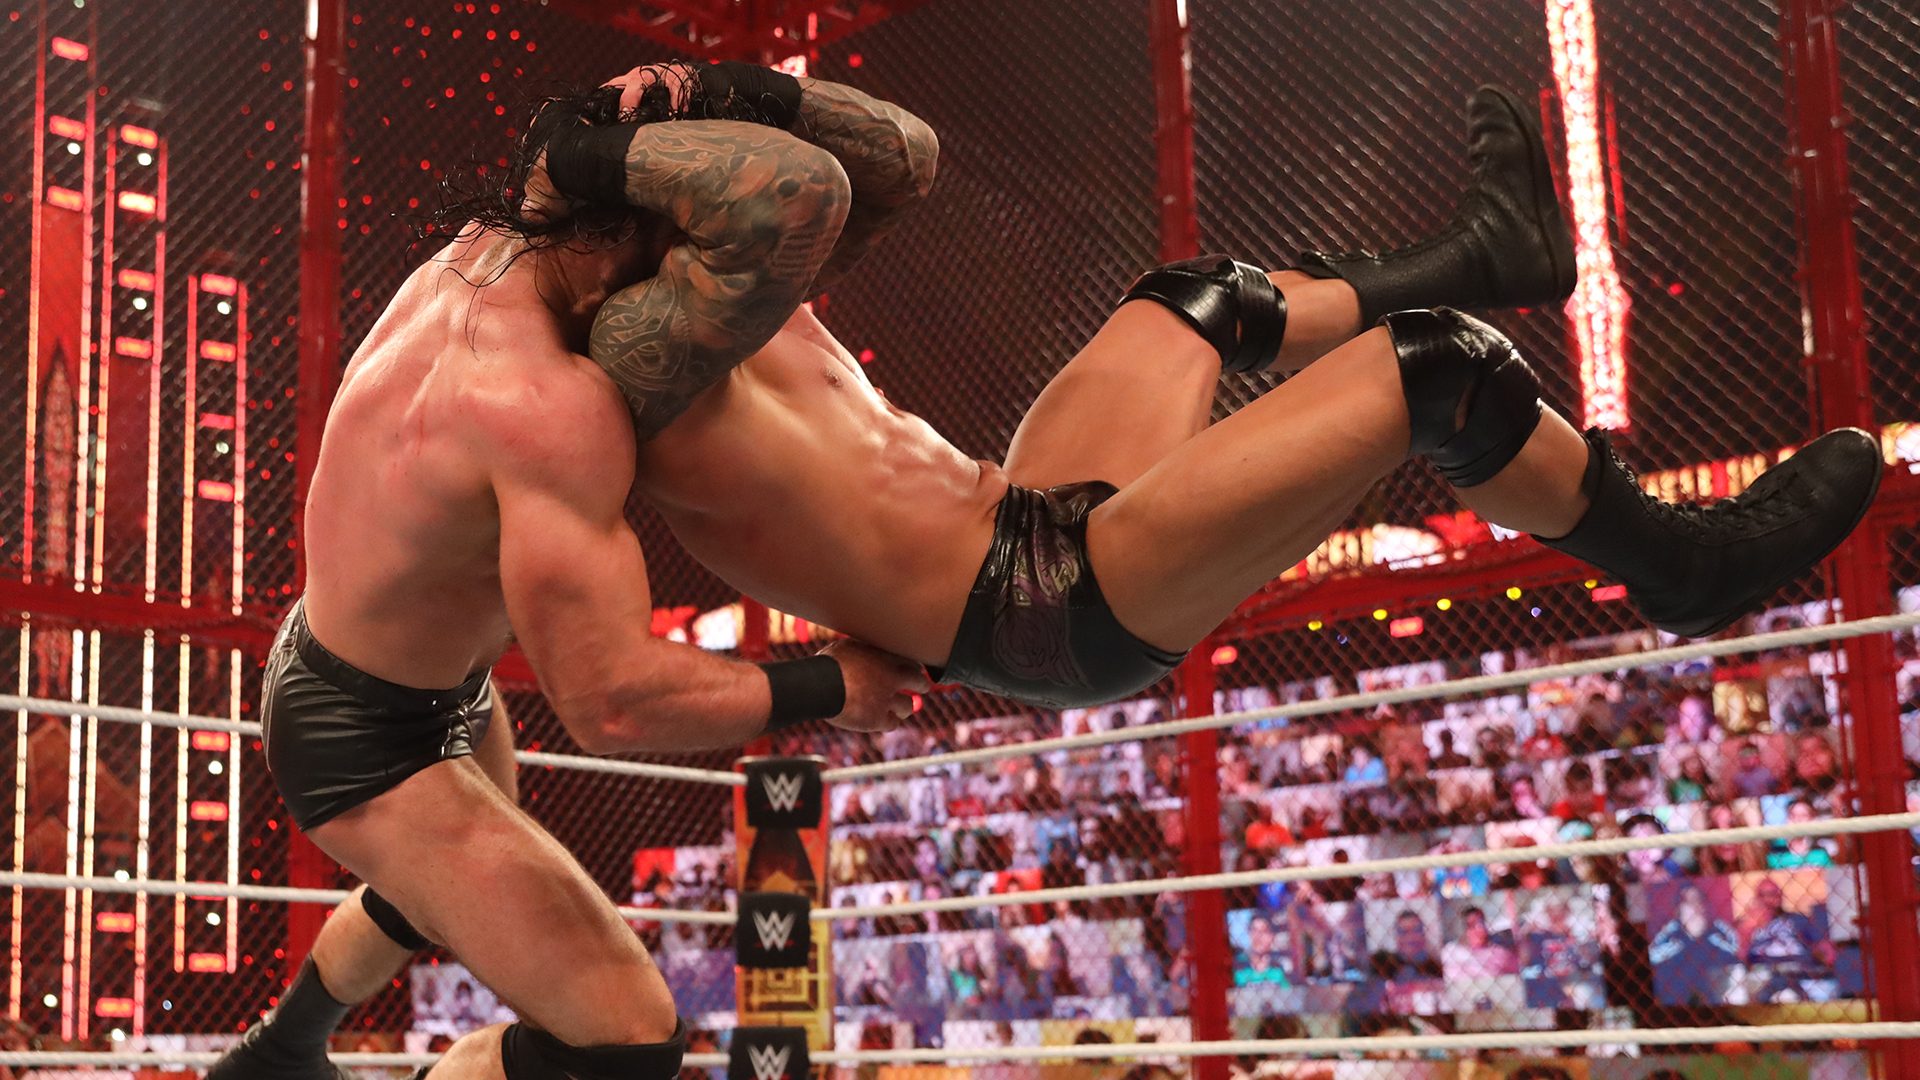 Randy Orton vence Drew McIntyre e conquista o WWE Championship